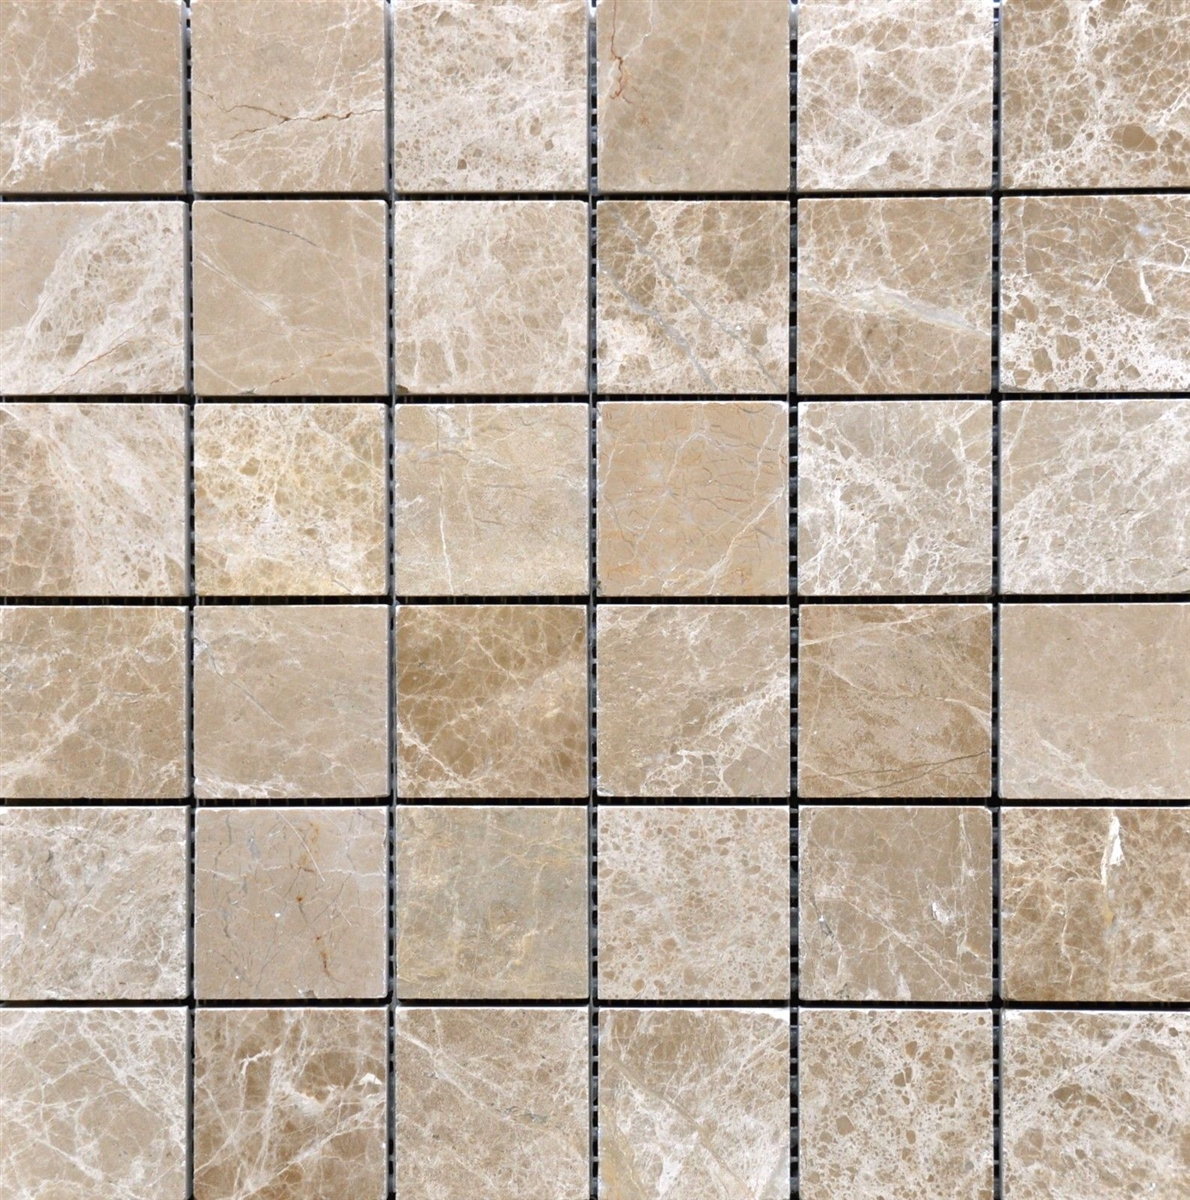 emperador light mosaic 2x2 tumbled marble tile